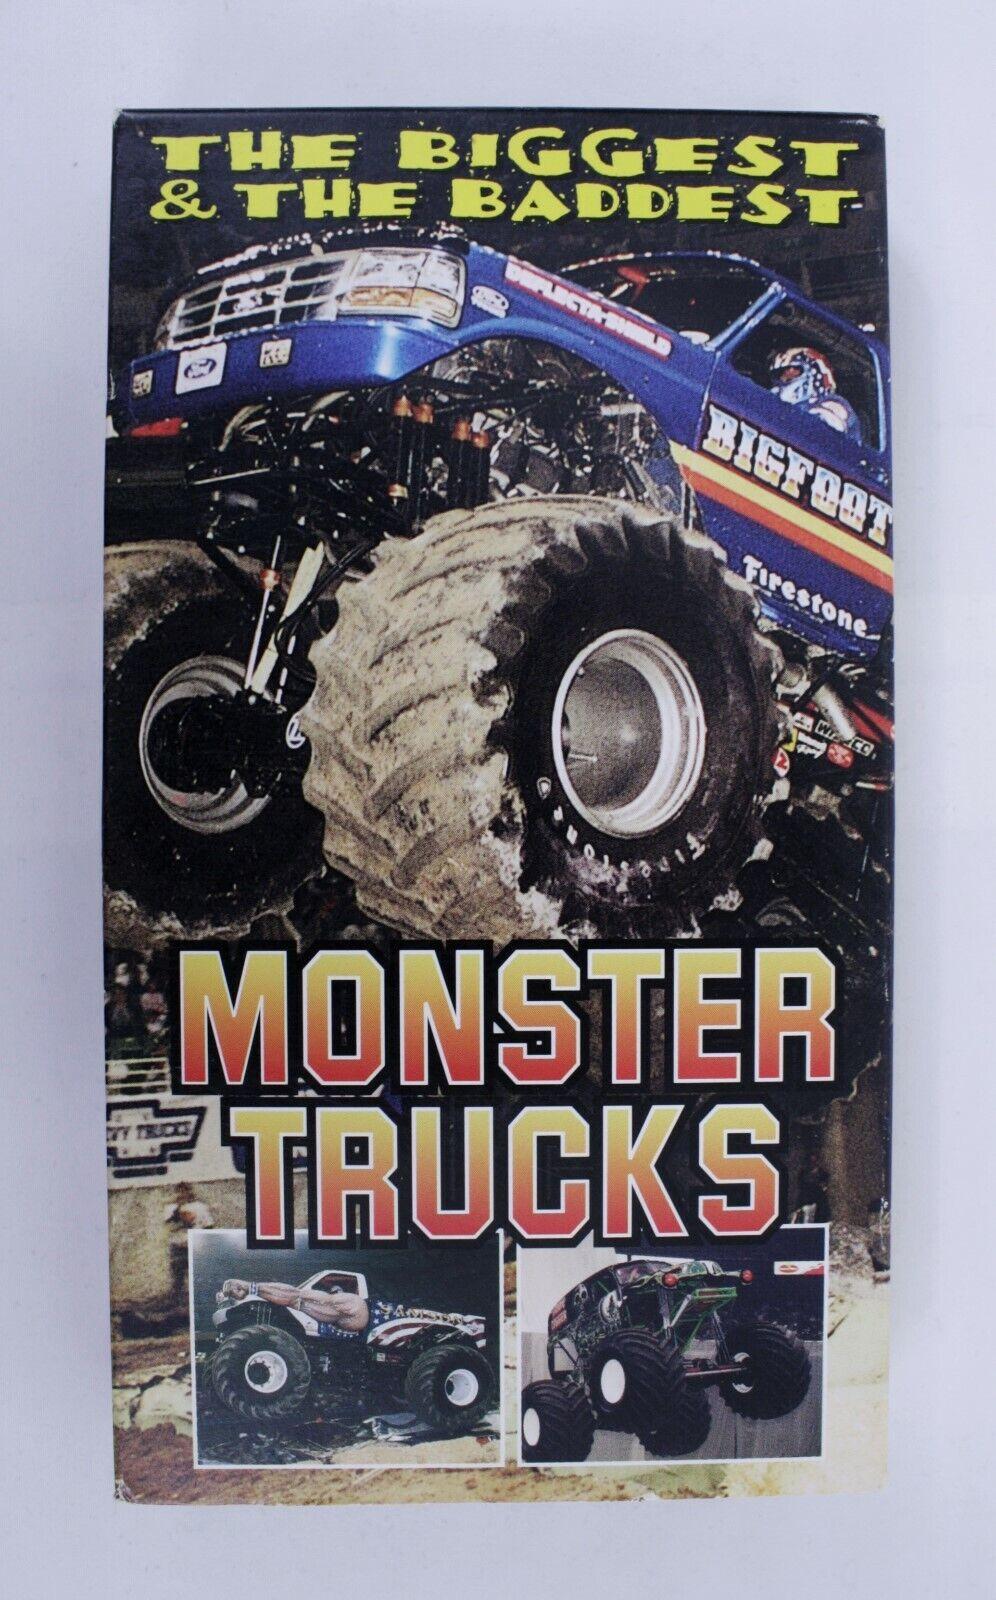 The Biggest And The Baddest Monster Trucks Vhs Video Bigfoot Grave Digger 0019405009556 For Sale Online